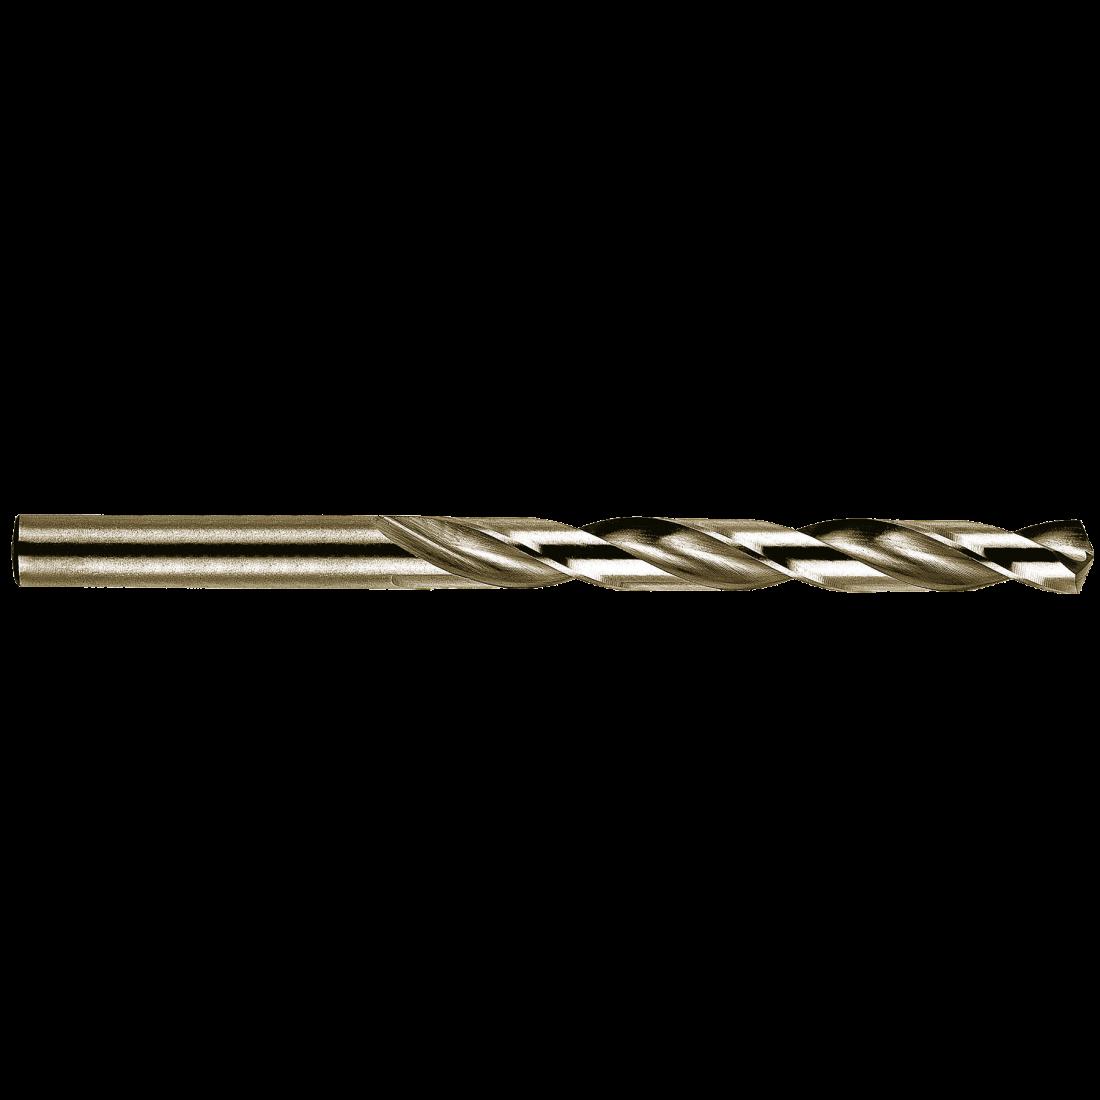 Сверло по металлу Heller НSS-Co DIN 338 RN  9x81x125мм (10шт)